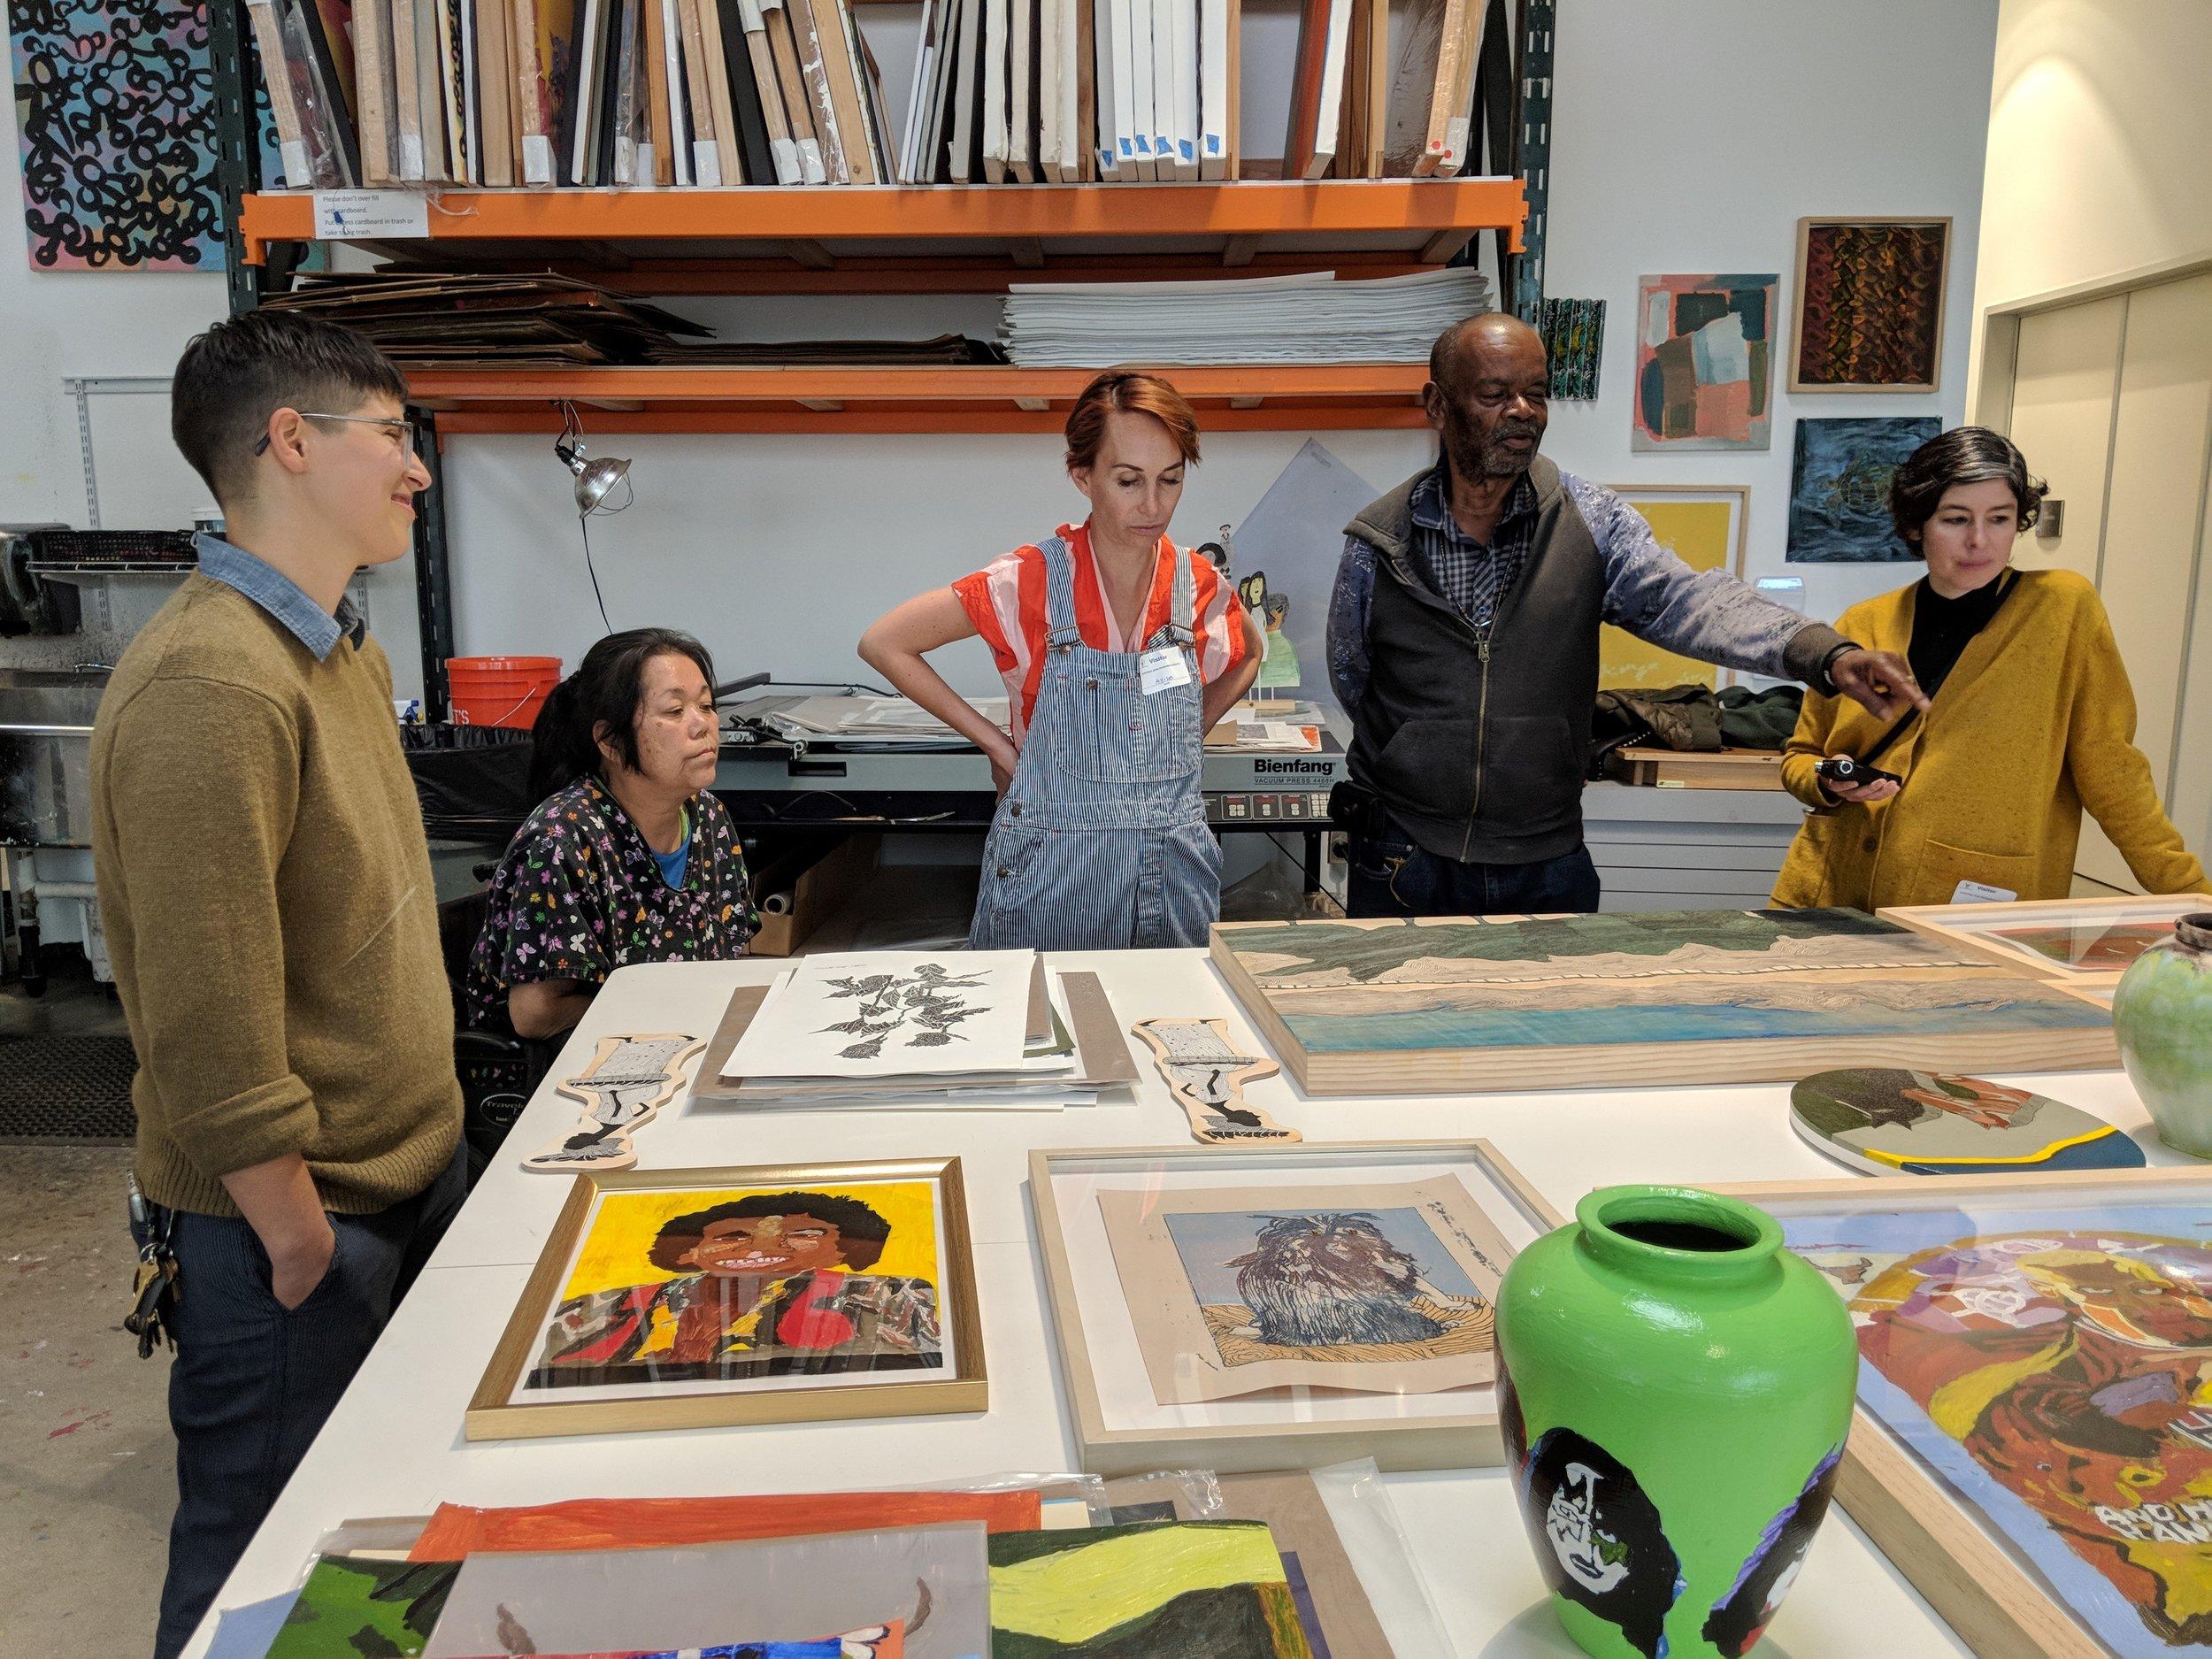 Image (left to right): ECF's Program Supervisor Eugenia Barbuc, artist Vickie Uyeda, The Main's director Allison Agsten, artist Milton Davis, and The Main's curatorial associate Monica Rodriguez looking at Milton's and Vickie's work at ECF